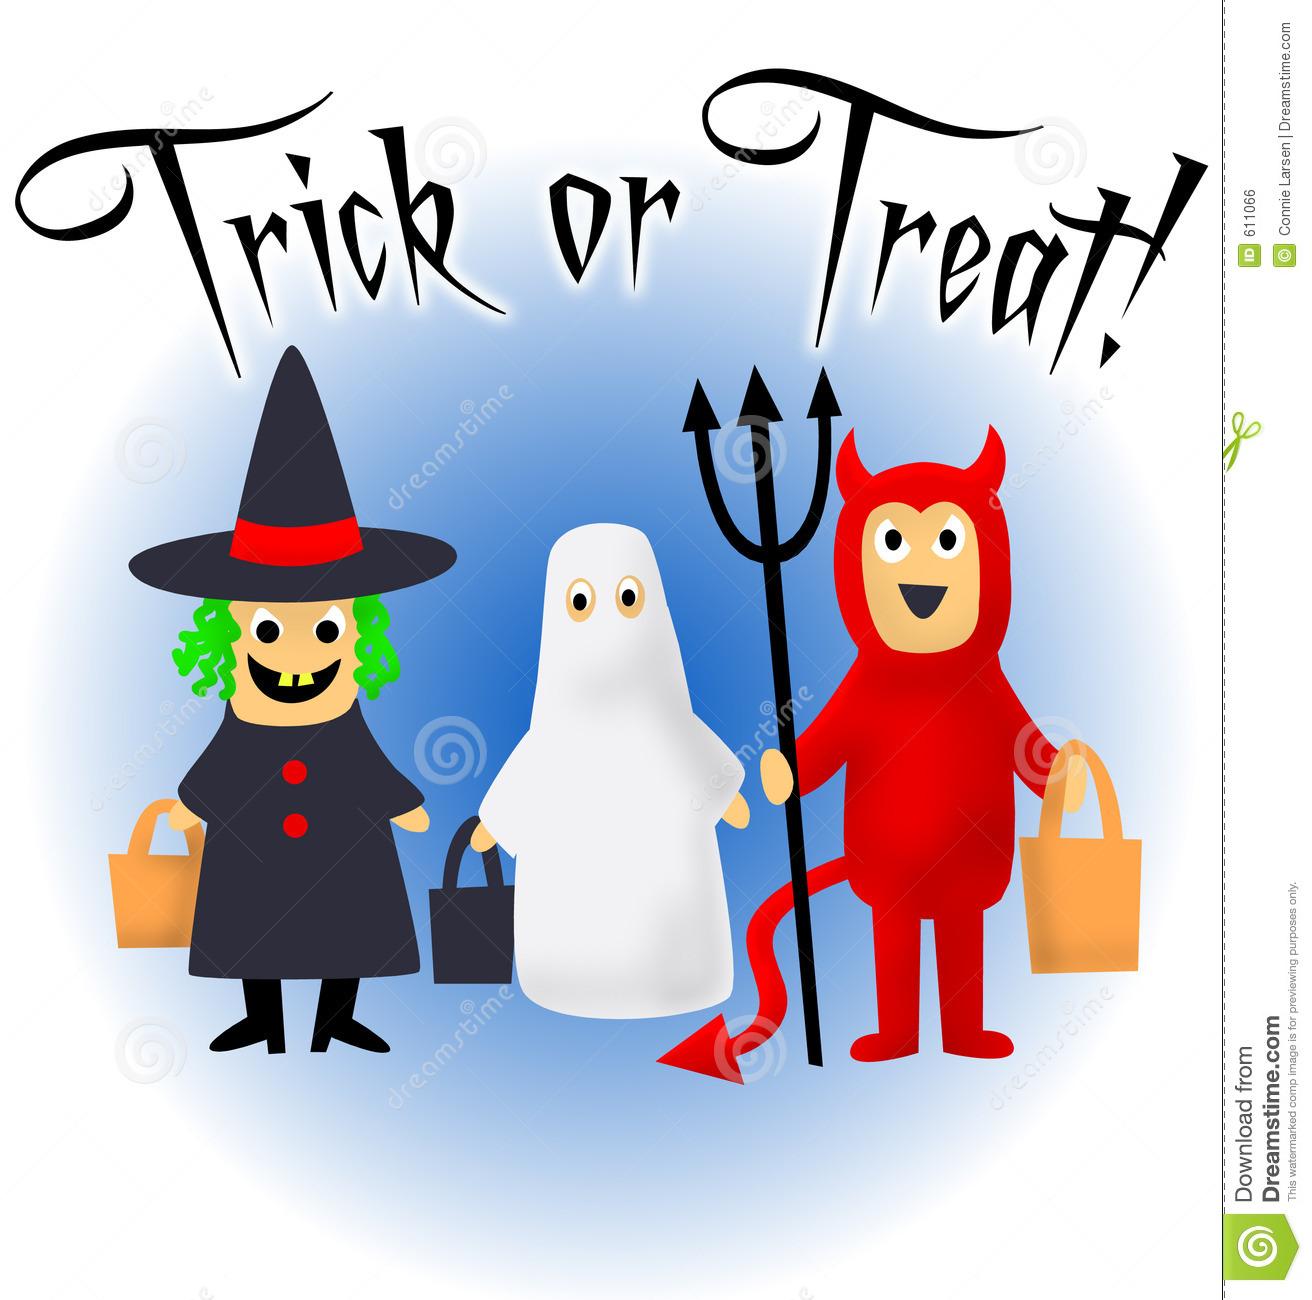 Spooky Halloween Clipart | Huckleberry Hearts